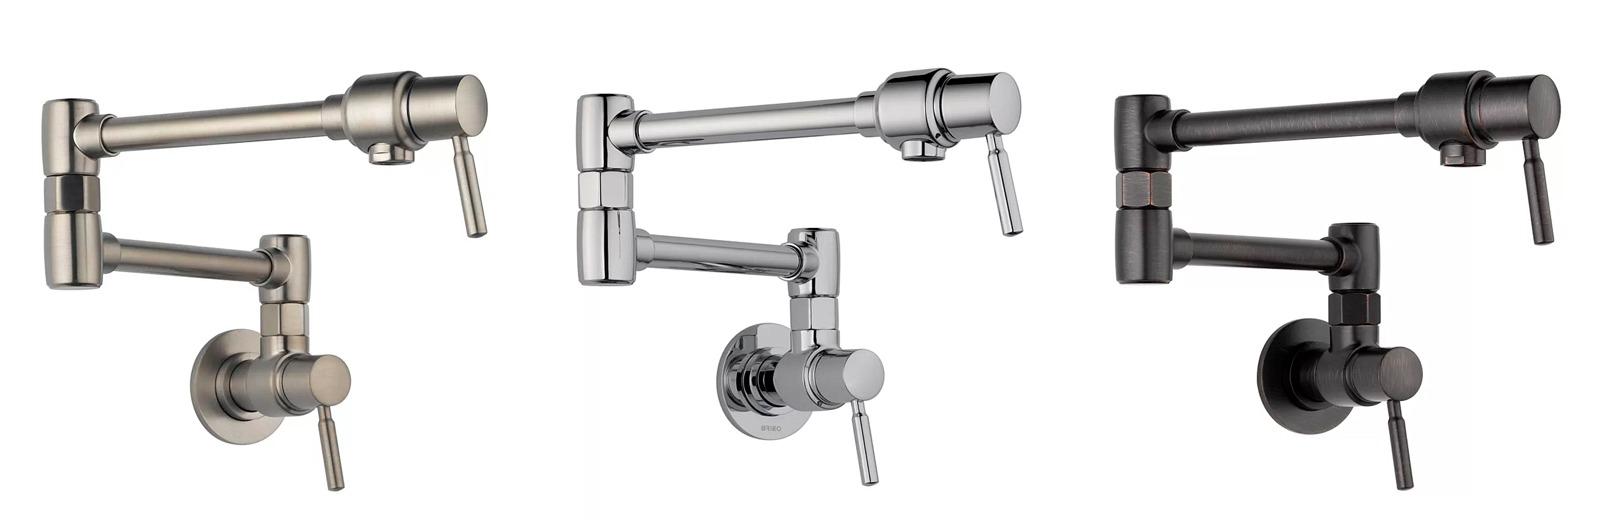 kitchen-diana-elizabeth-photography-blog-build-dot-com-brizo-pot-filler-above-stove-height-install-3